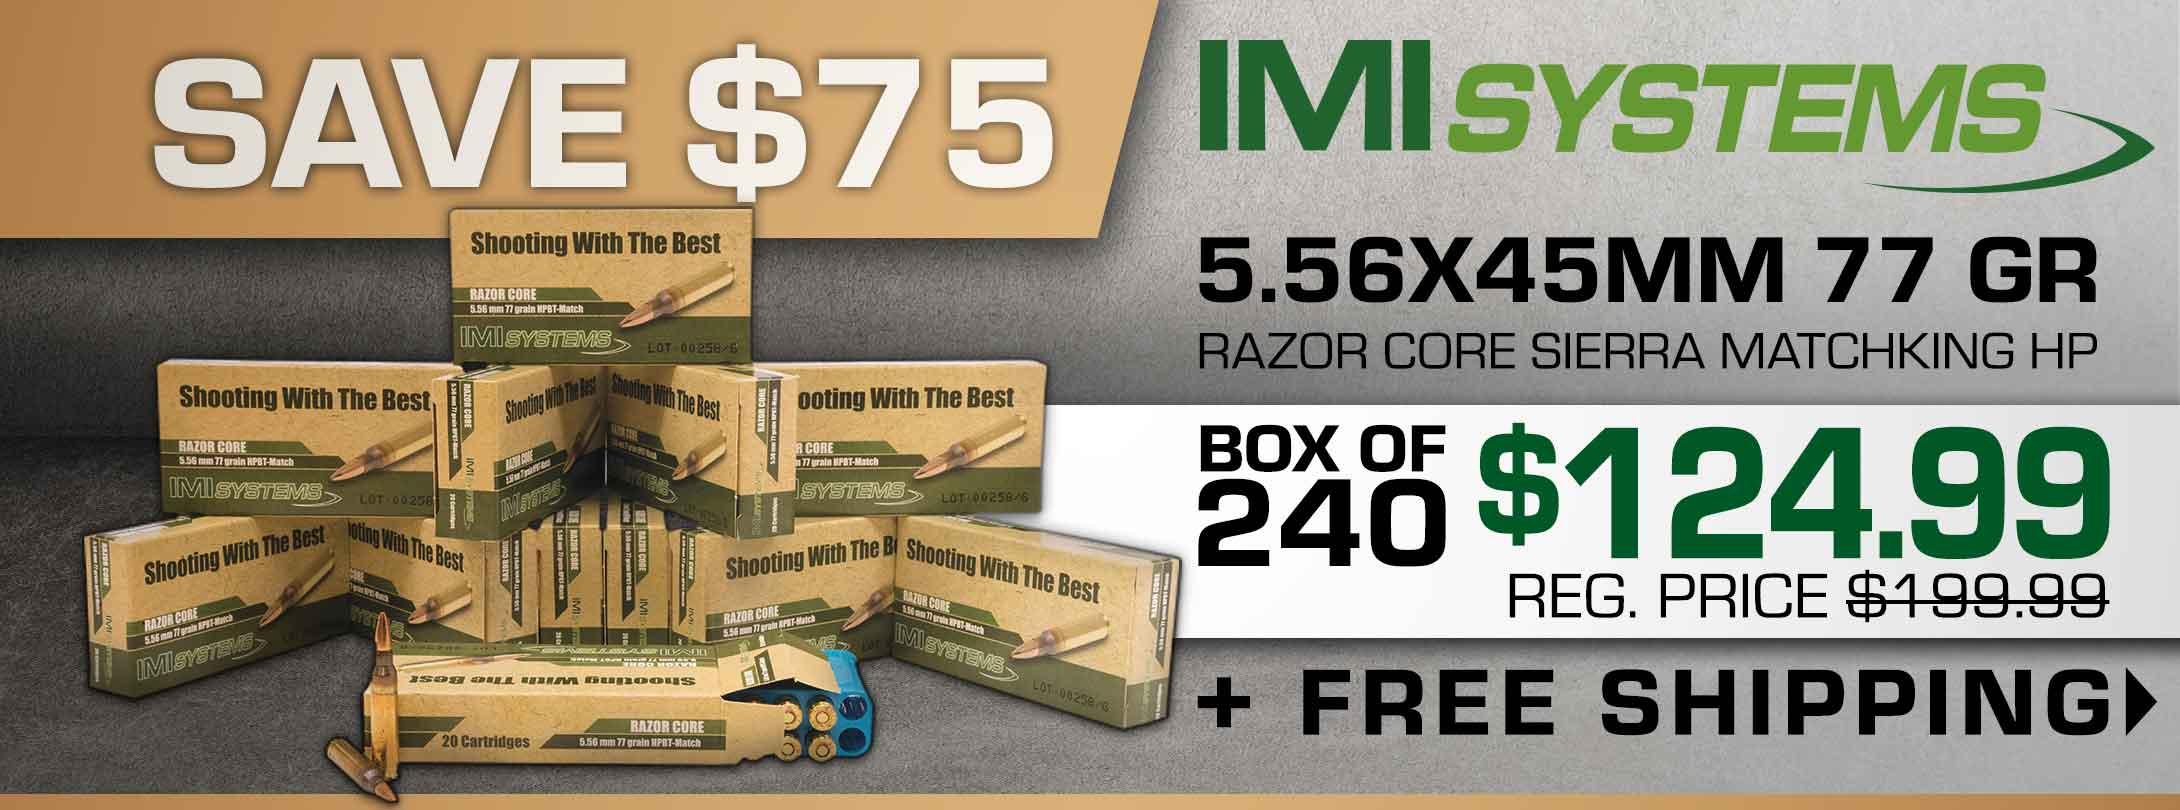 Save on IMI 5.56 Razor Core